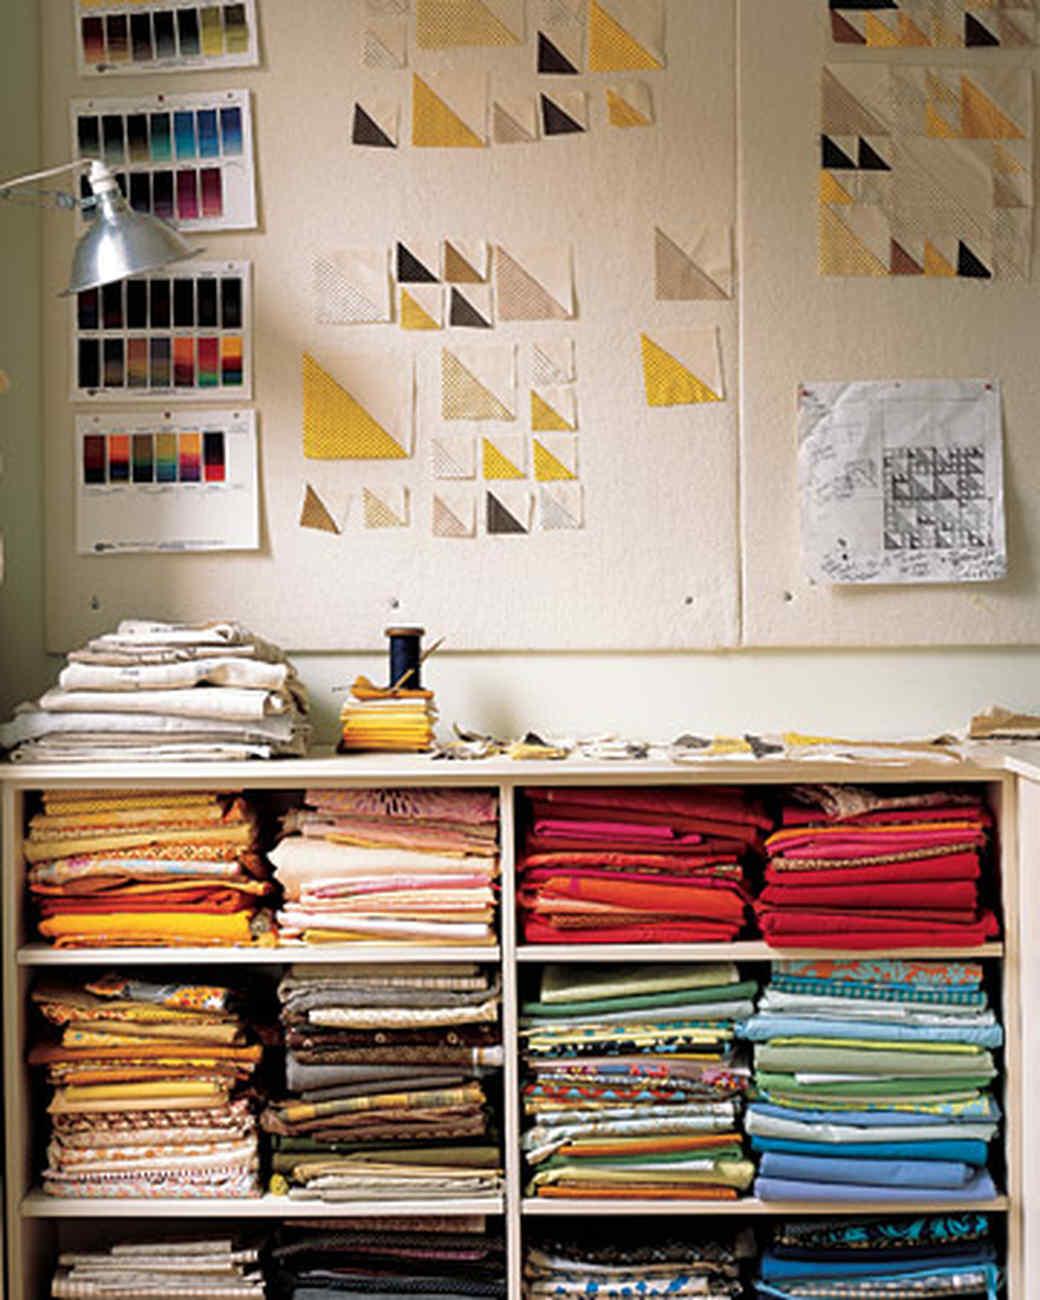 pa102972_0507_fabricboard.jpg